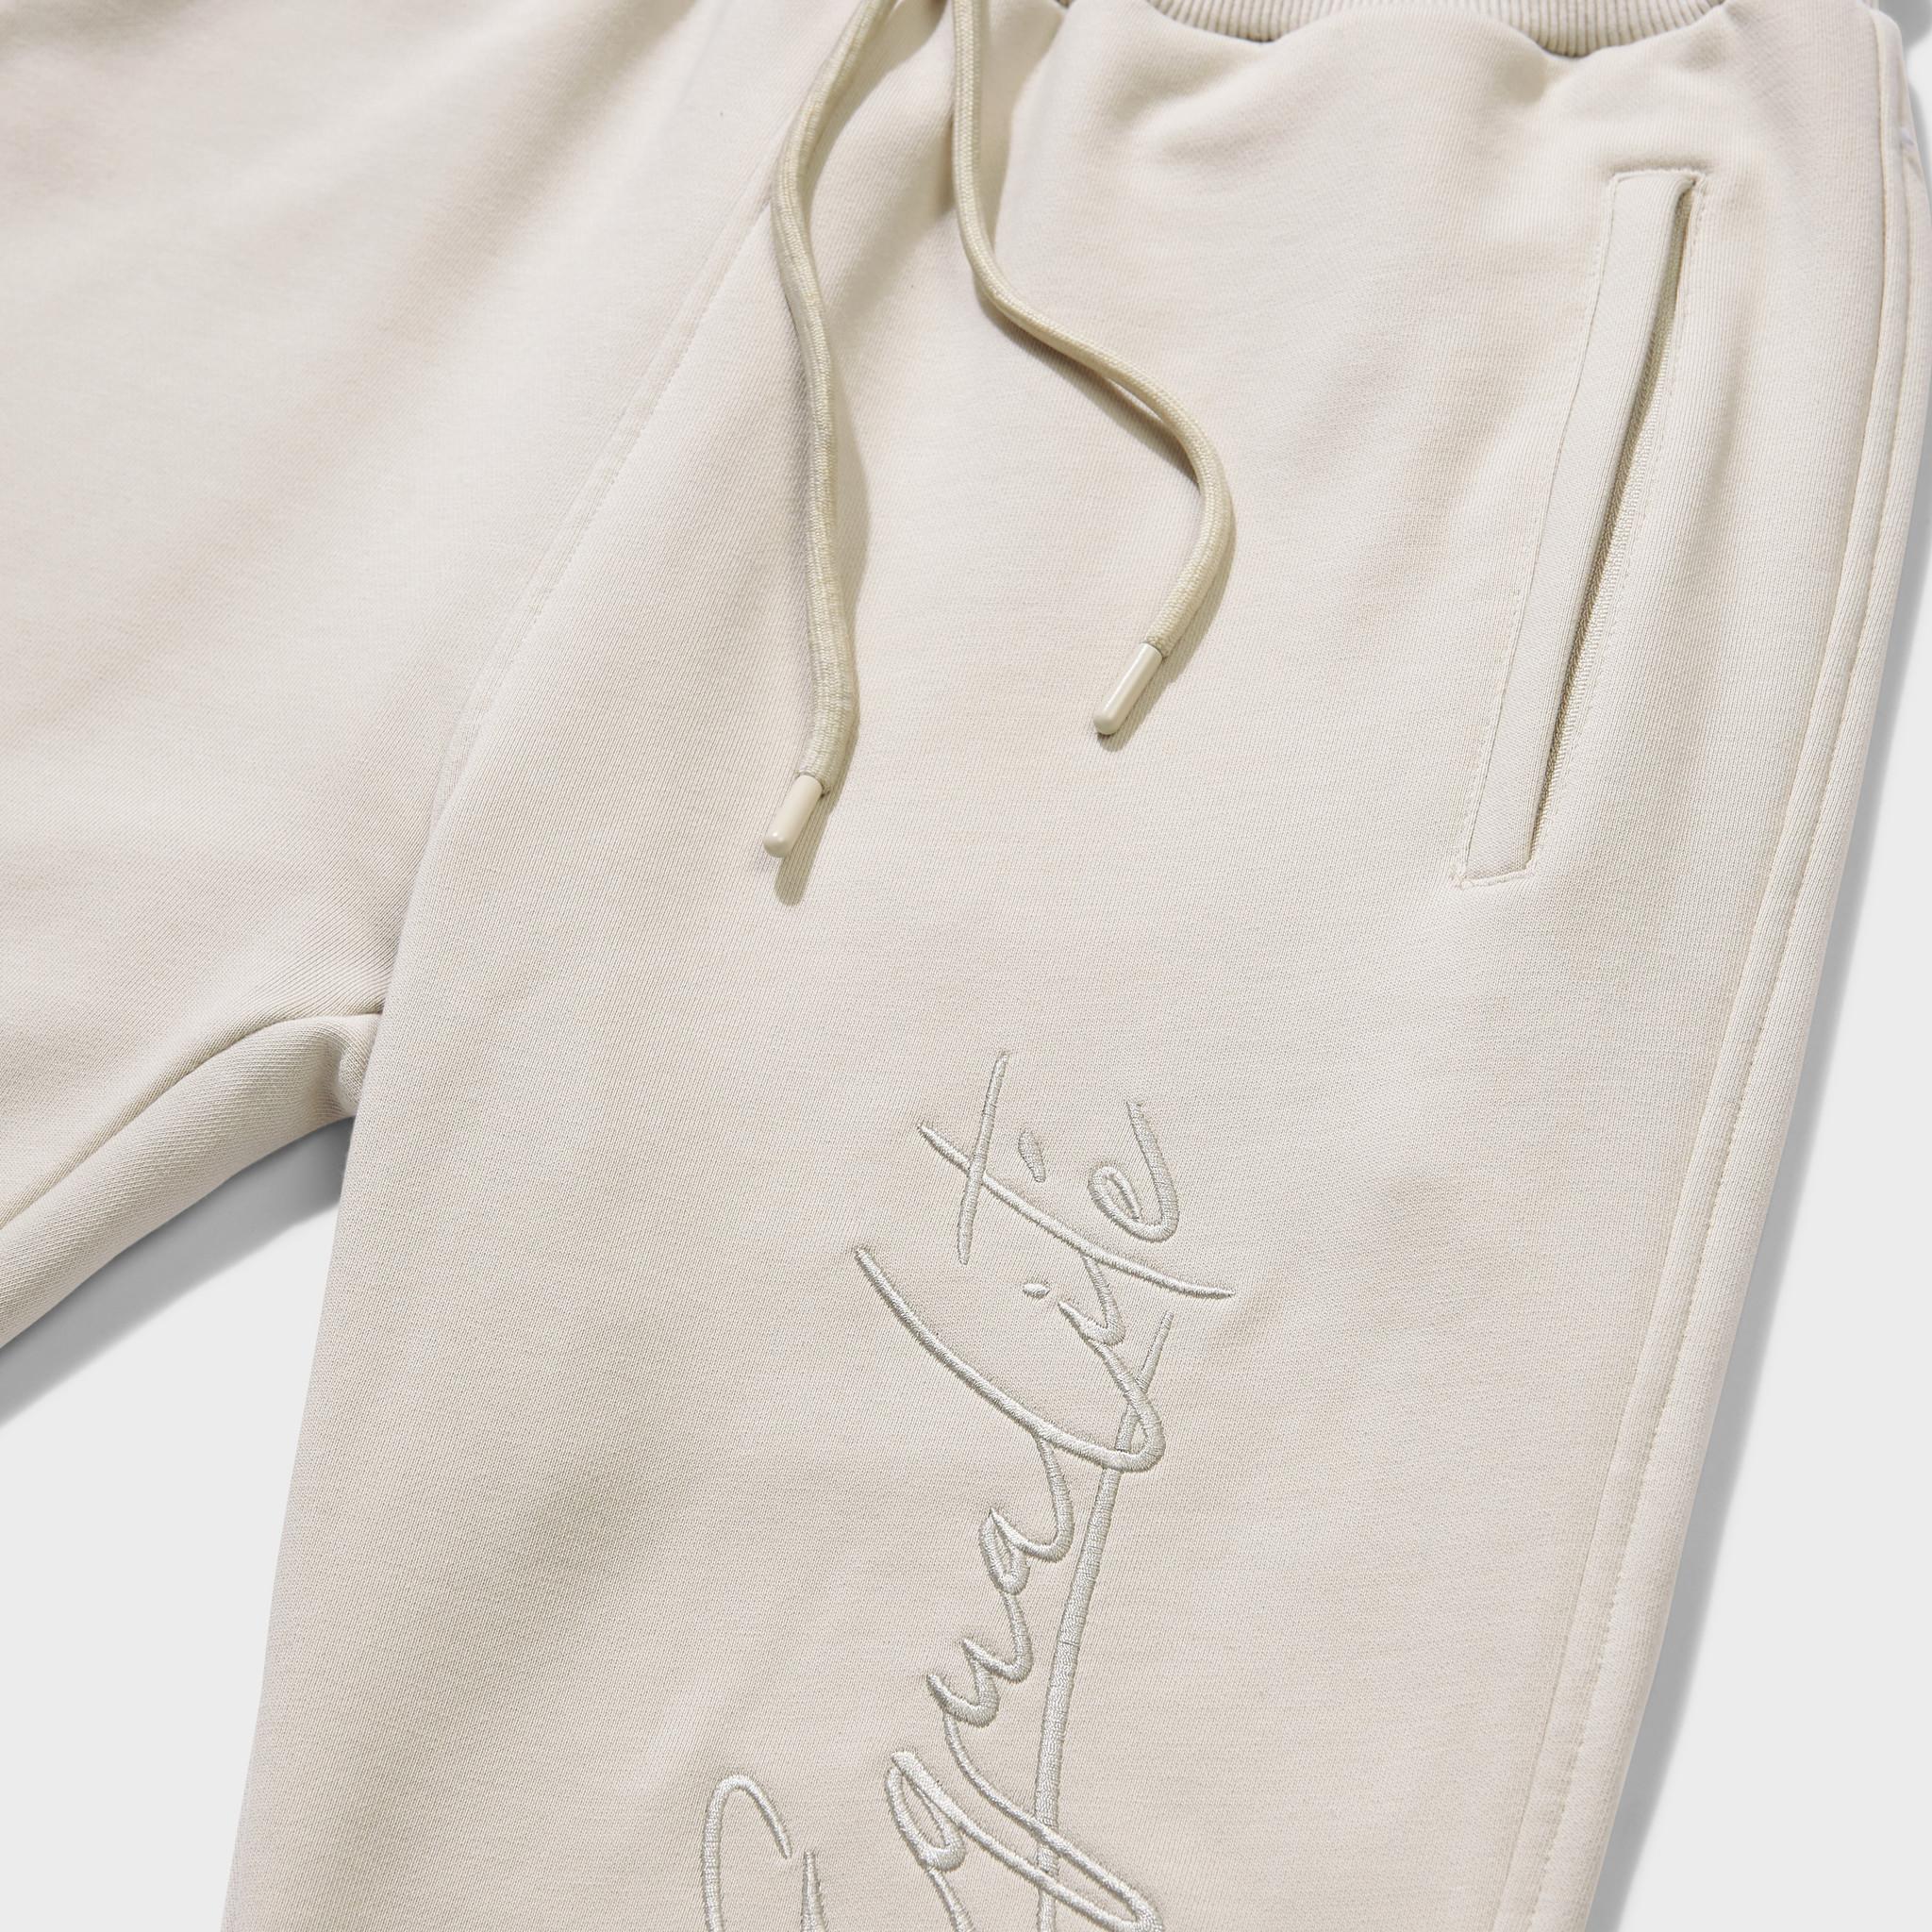 Wafi Signature Pants Beige-3